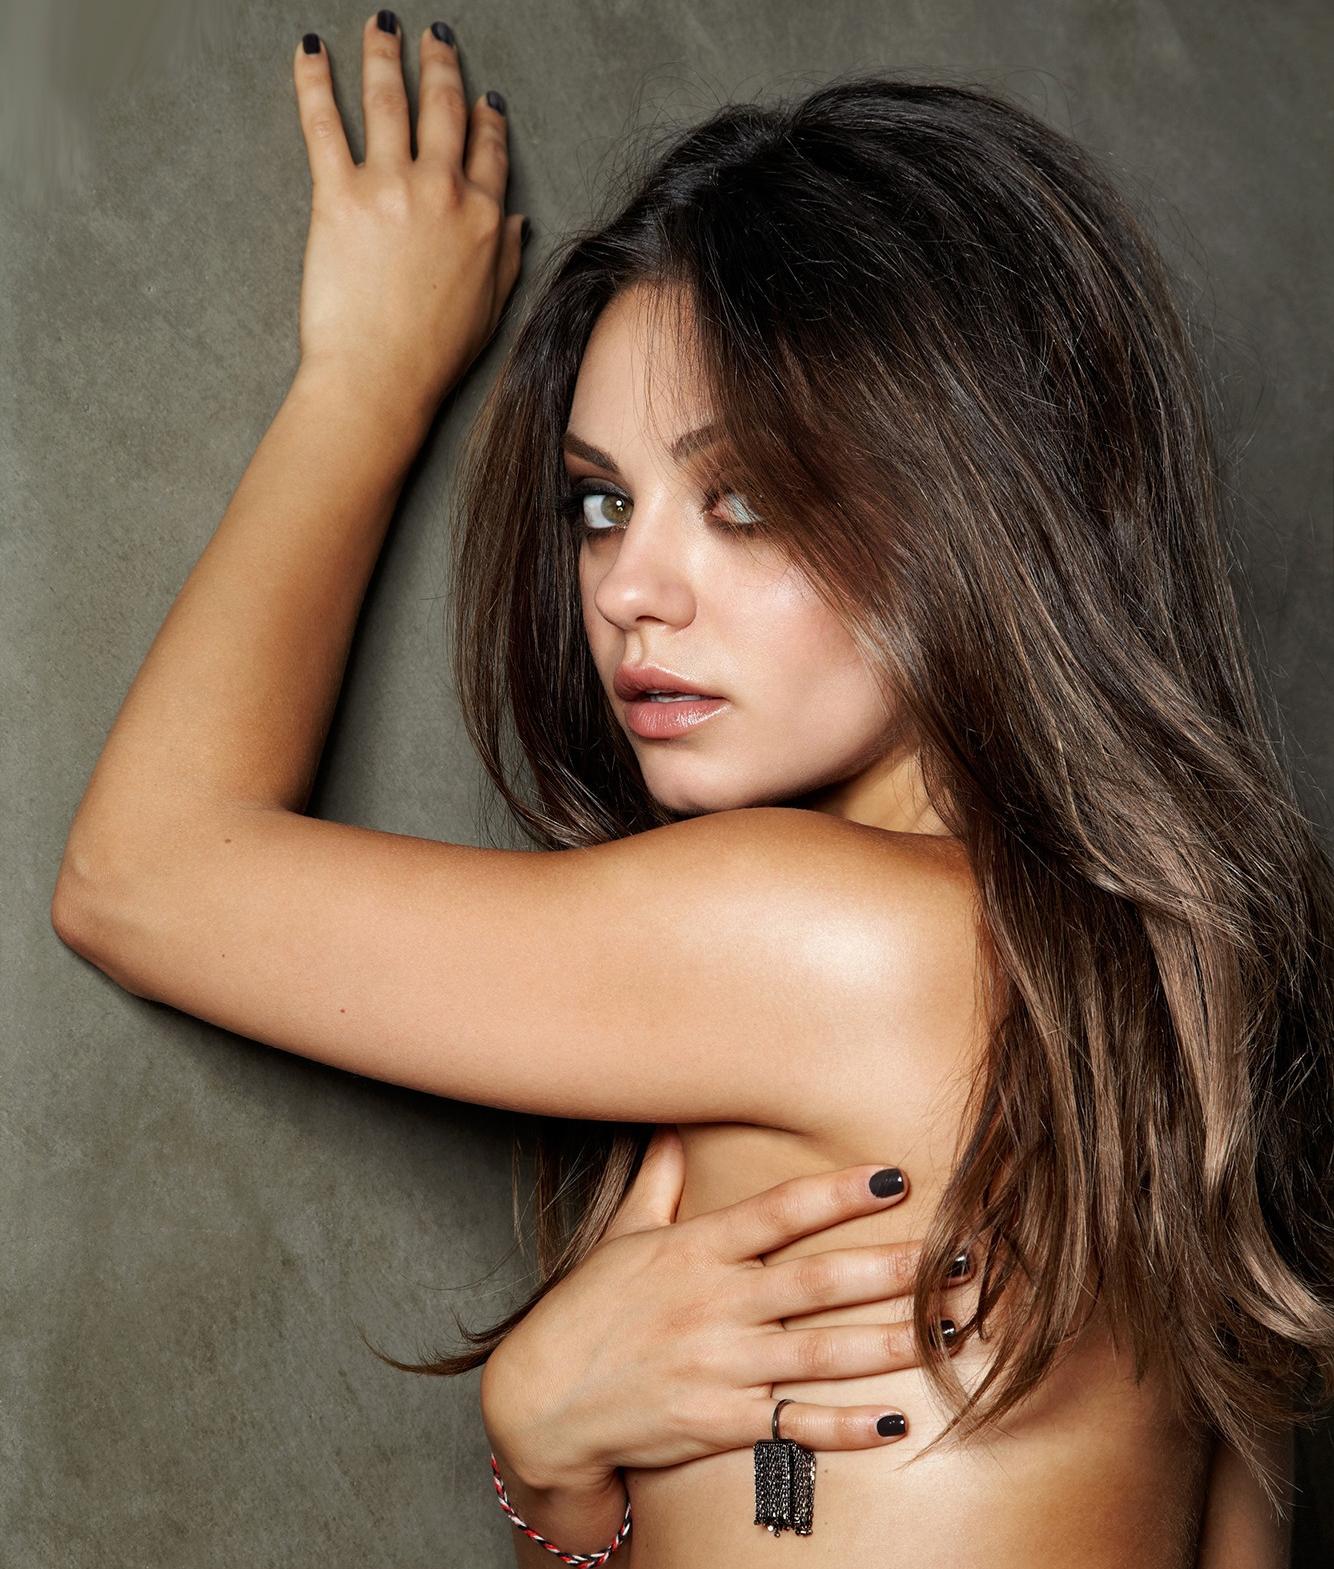 Mila kunis sexy pics erotic photos of celebrities and sexy actresses